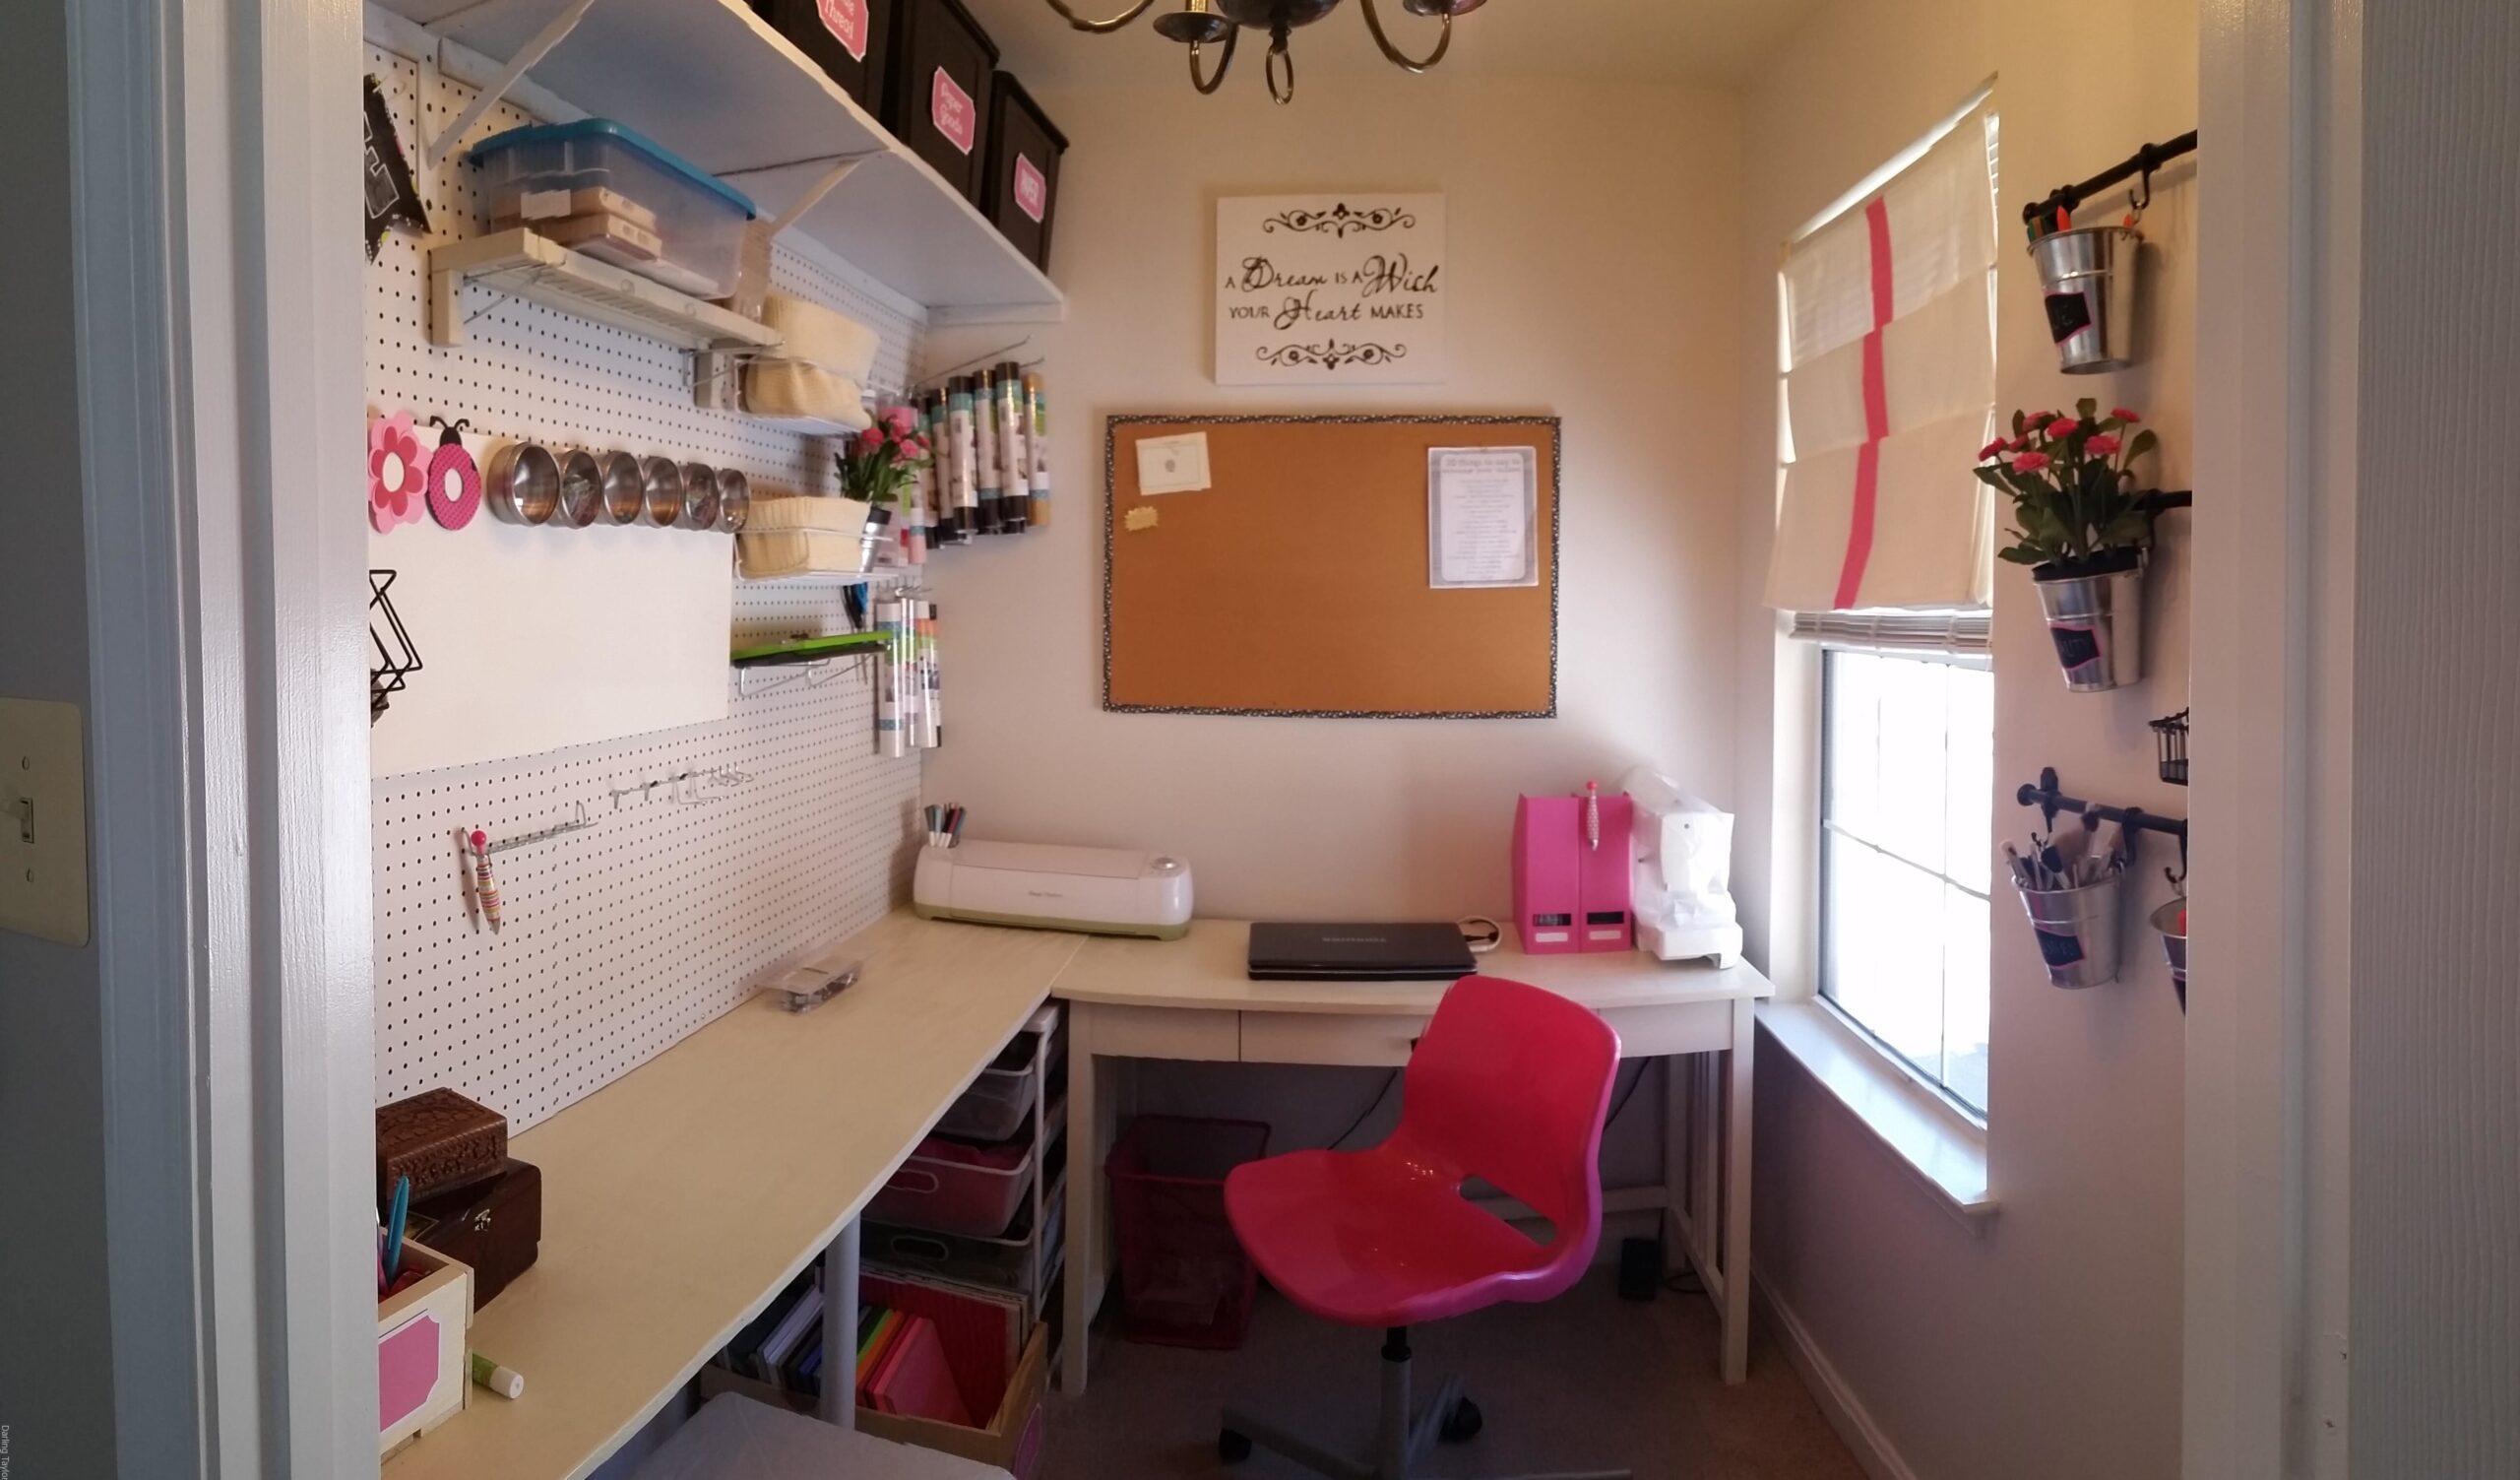 Turn a Closet into a Craft Room